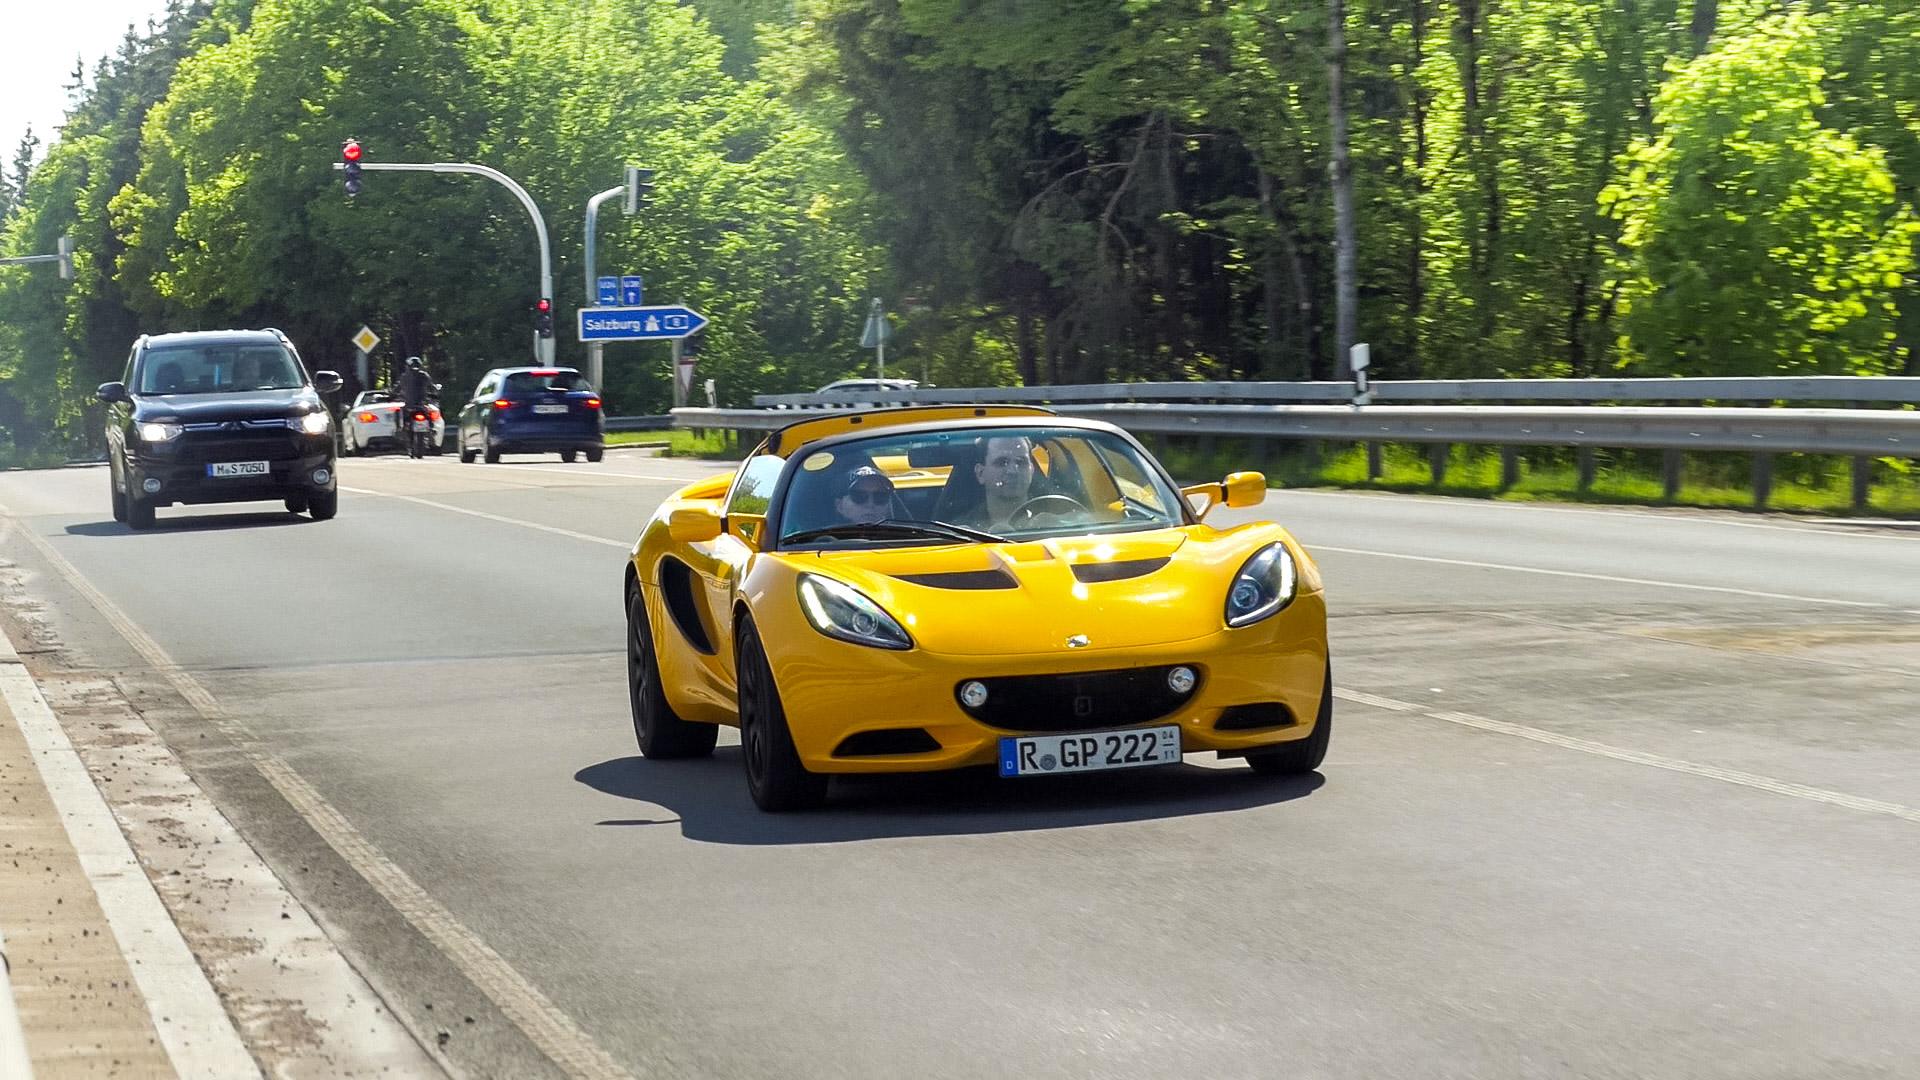 Lotus Elise S2 - R-GP-222